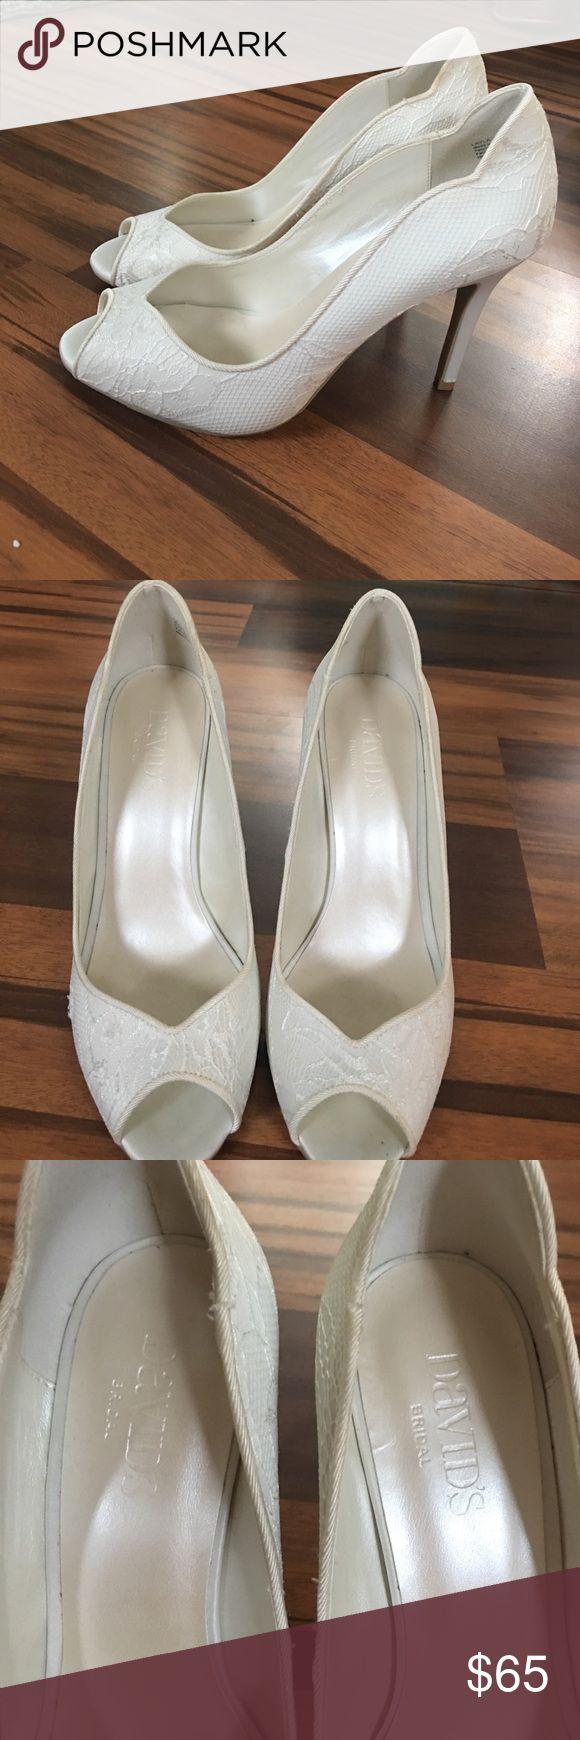 David's Bridal wedding shoes! Brand new, never worn. Size 7.5M. Ivory. David's Bridal Shoes Heels